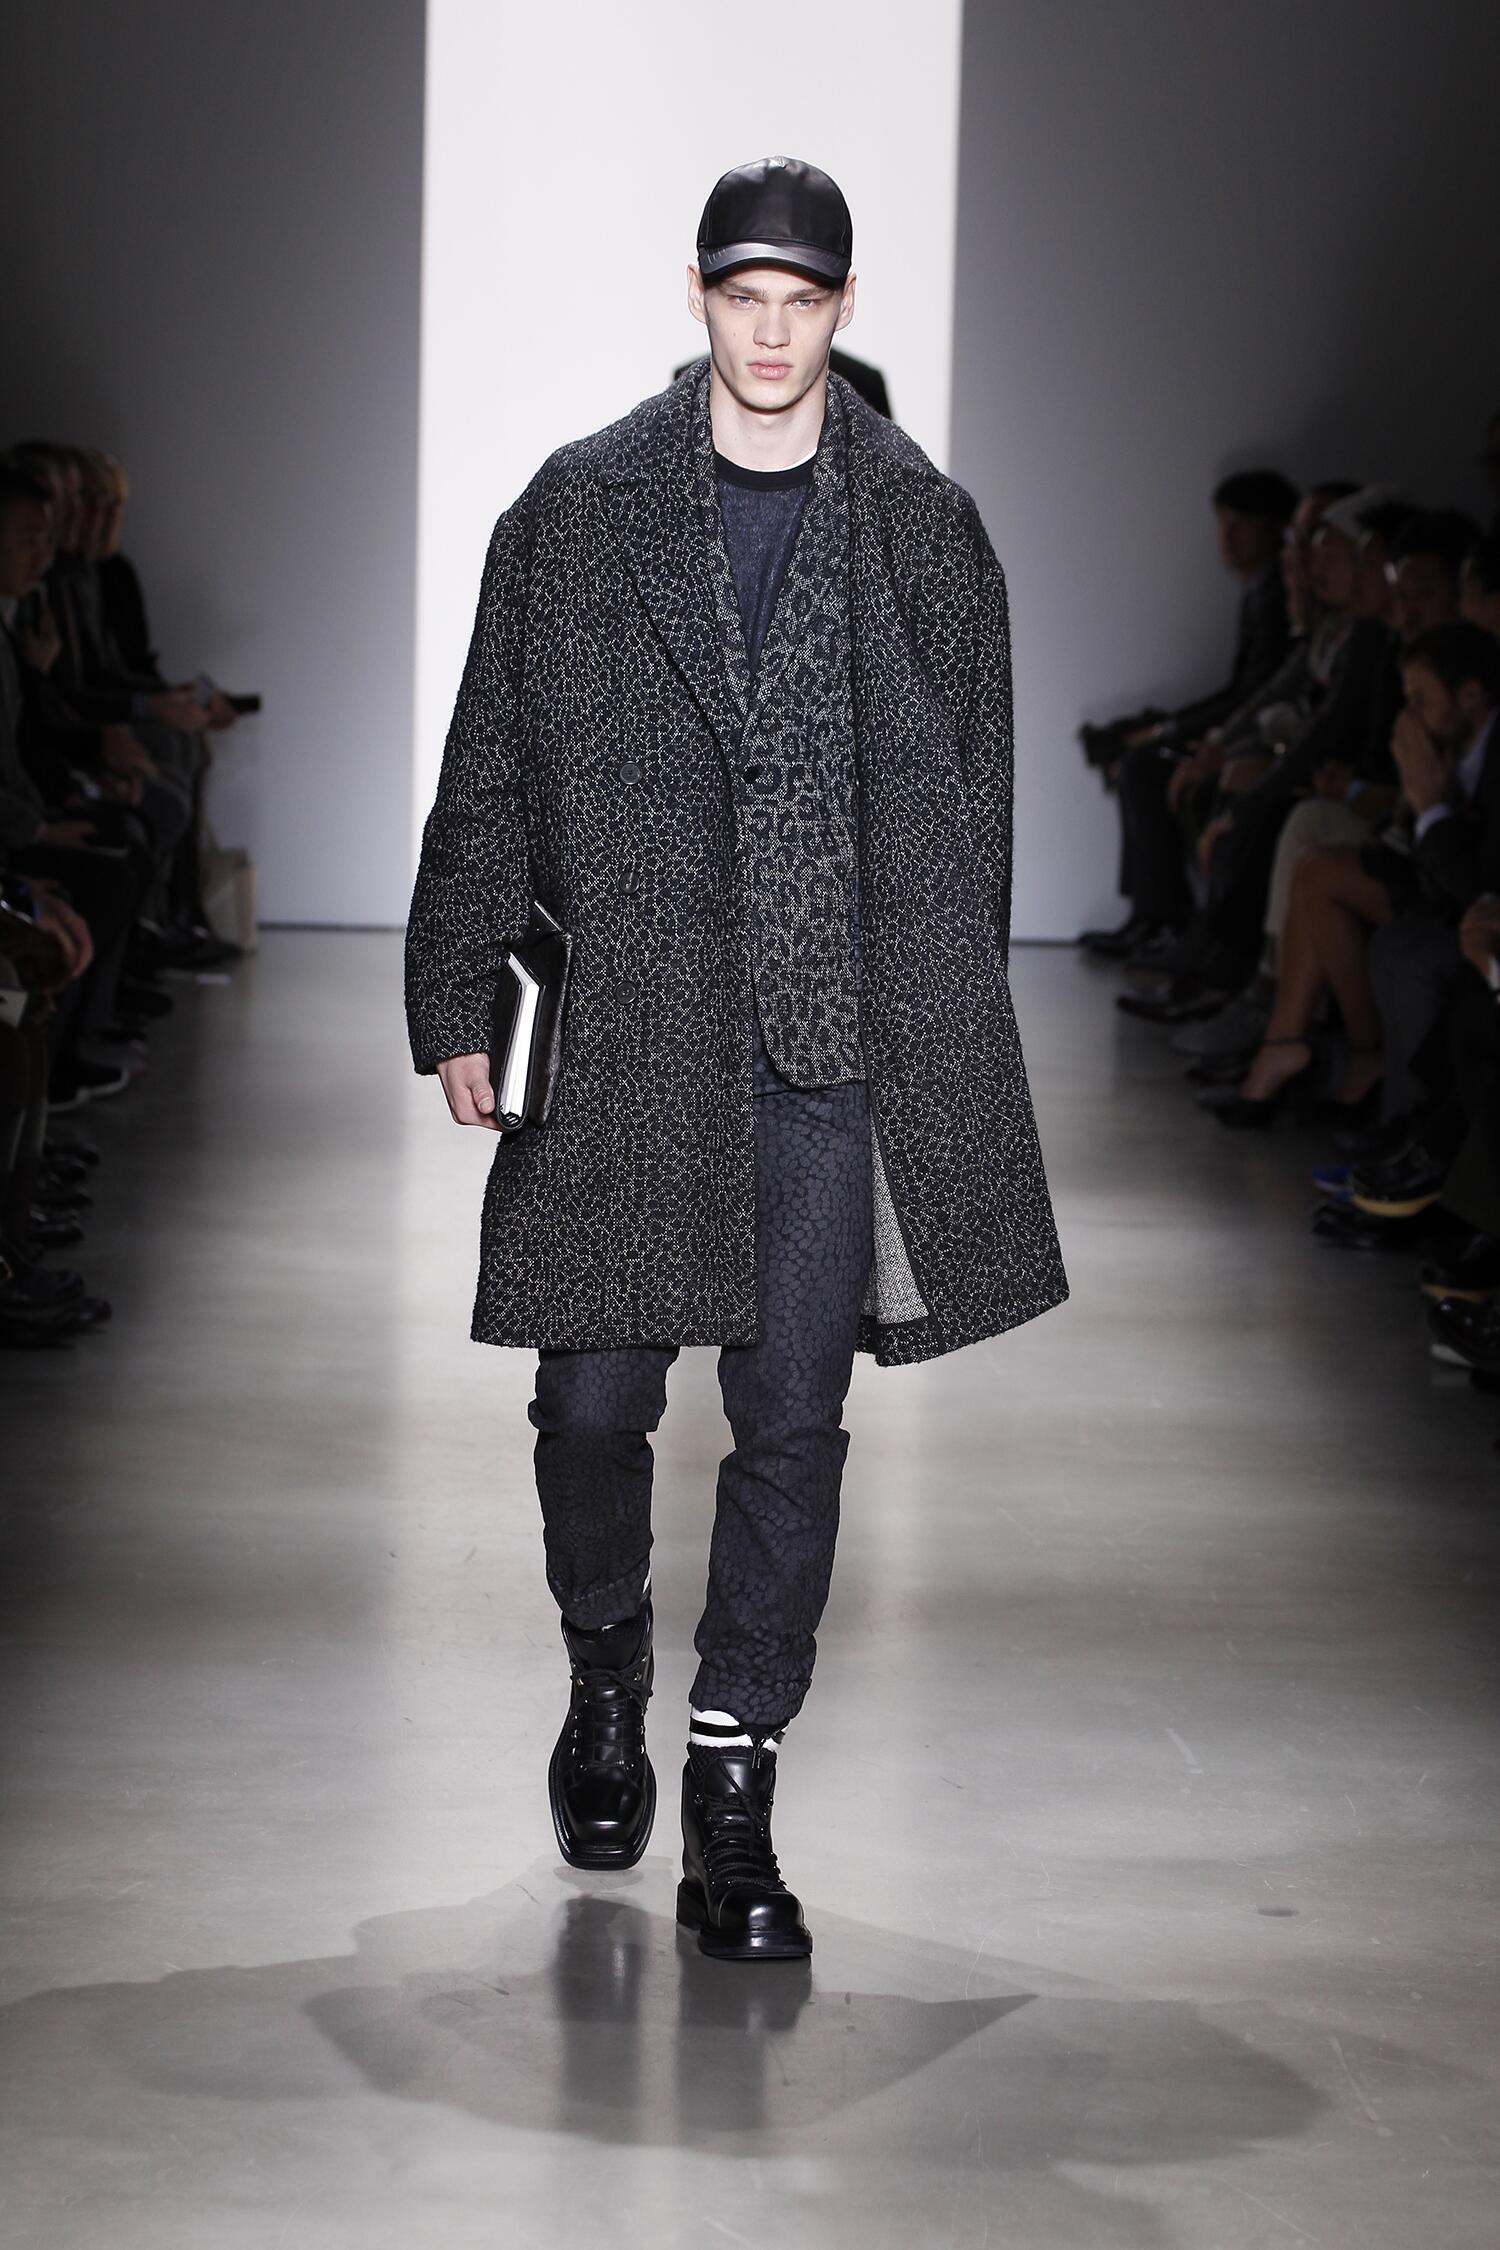 Fashion Man Model Calvin Klein Collection Catwalk